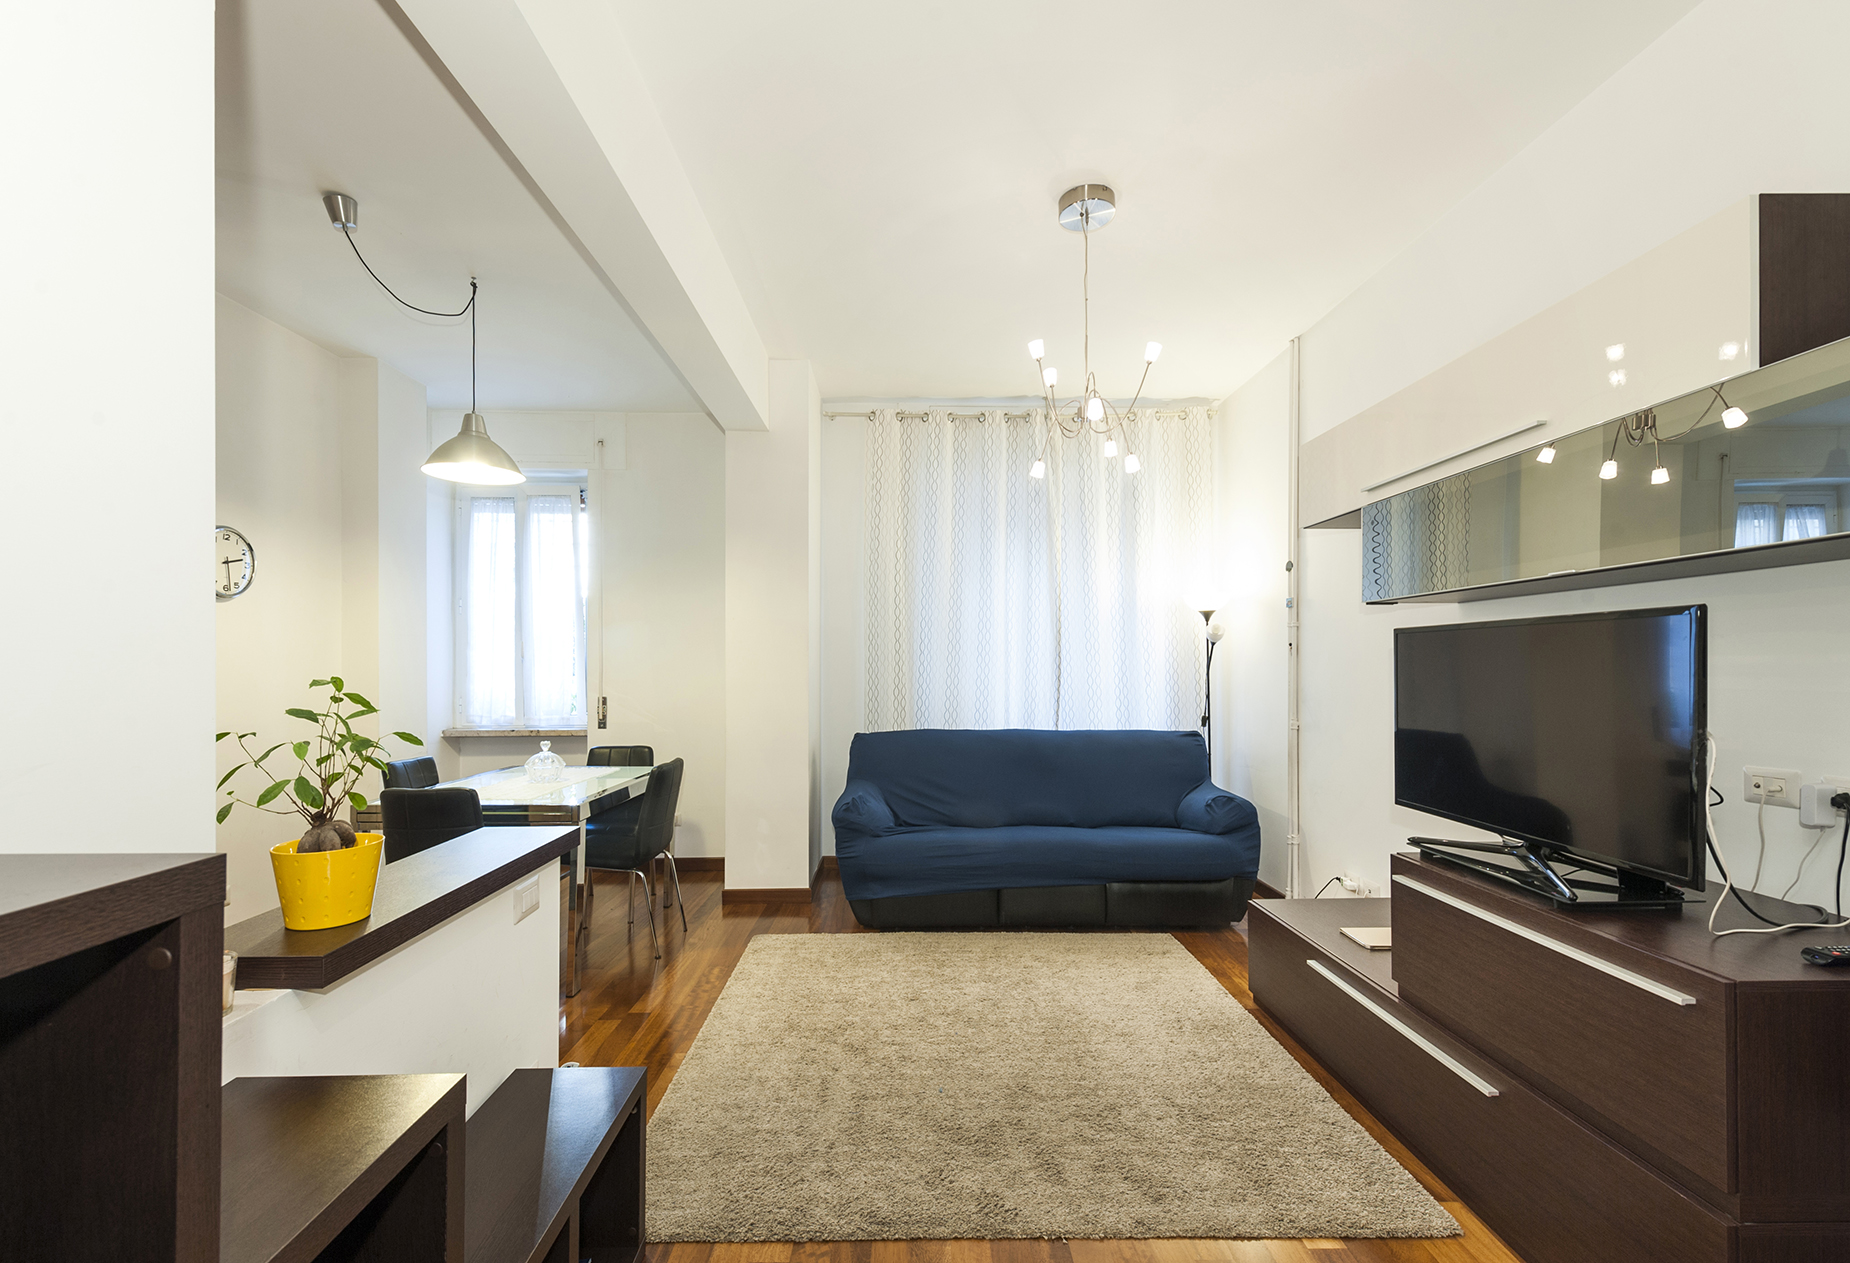 Wohnung für Verkauf beim Renovated apartment in the Prati neighborhood Via Costabella Rome, Rome 00195 Italien